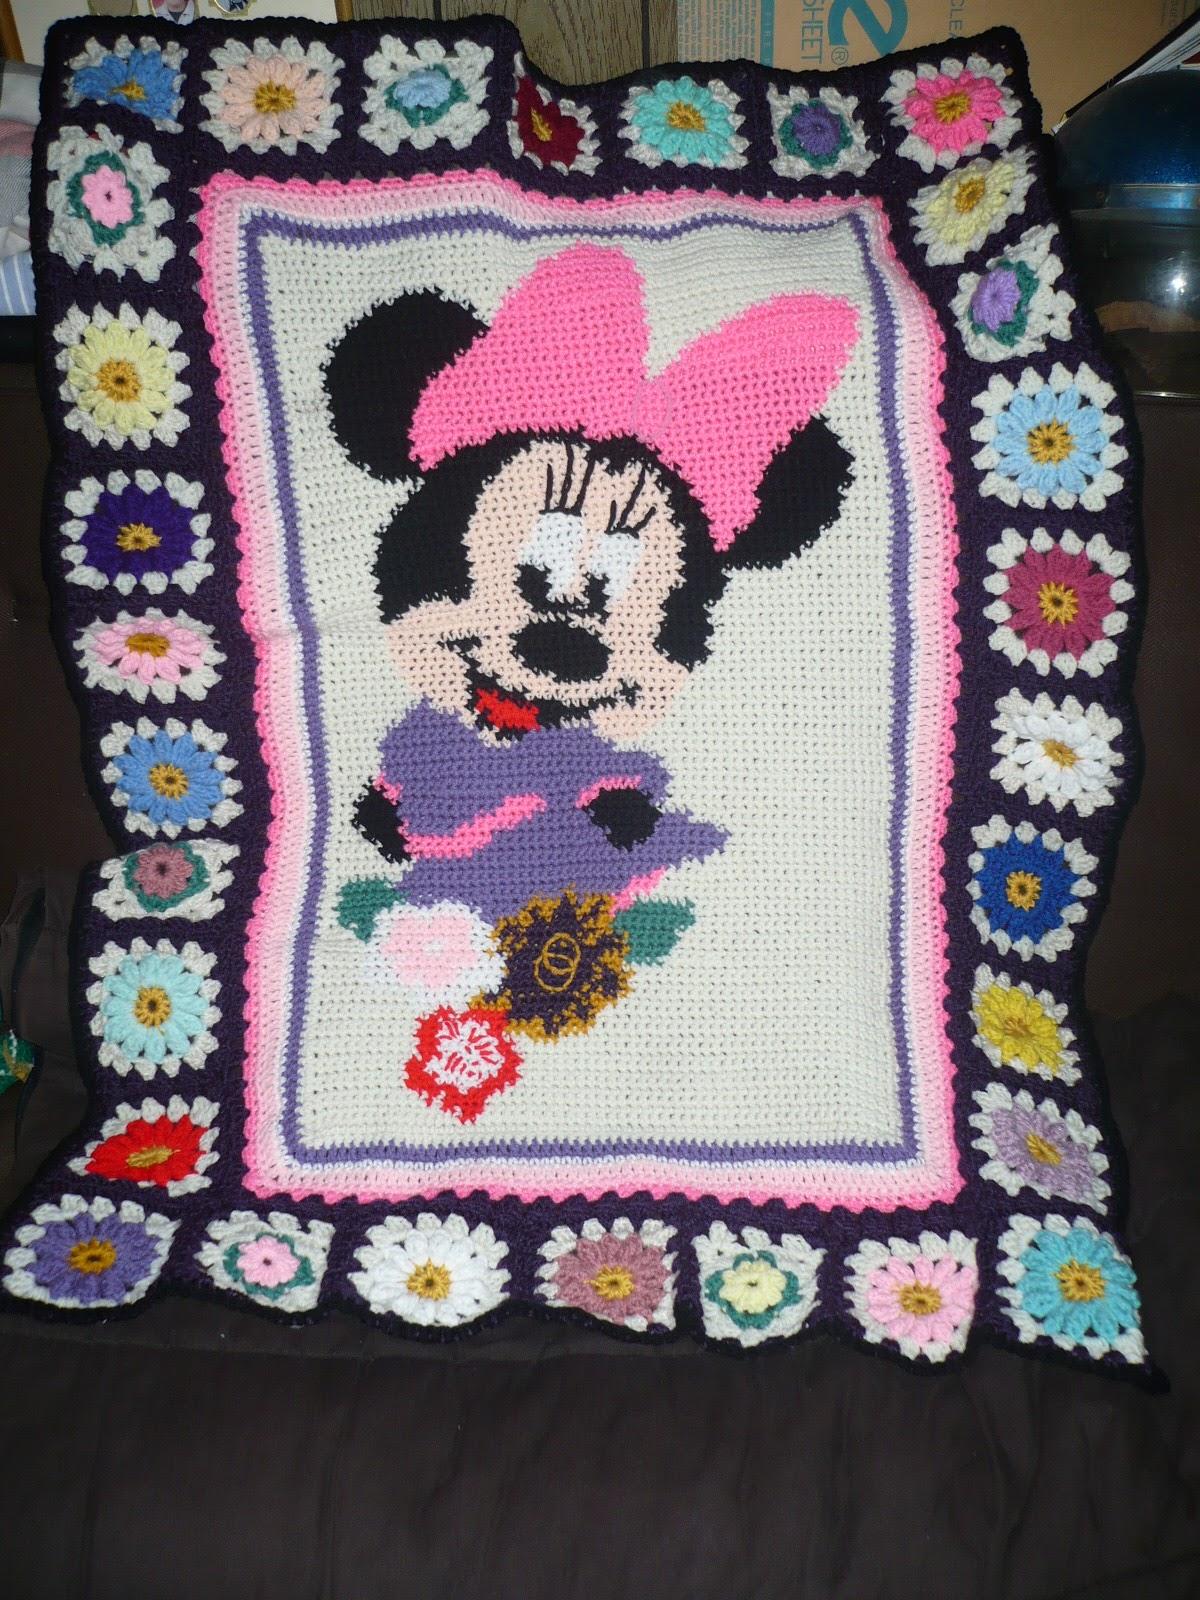 Stitches Crochet Minnie Mouse Blanket